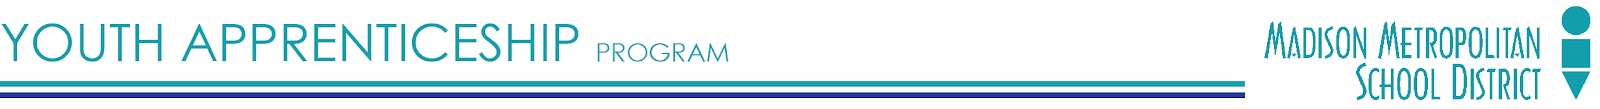 MMSD Youth Apprenticeship Program Application SY15 Logo